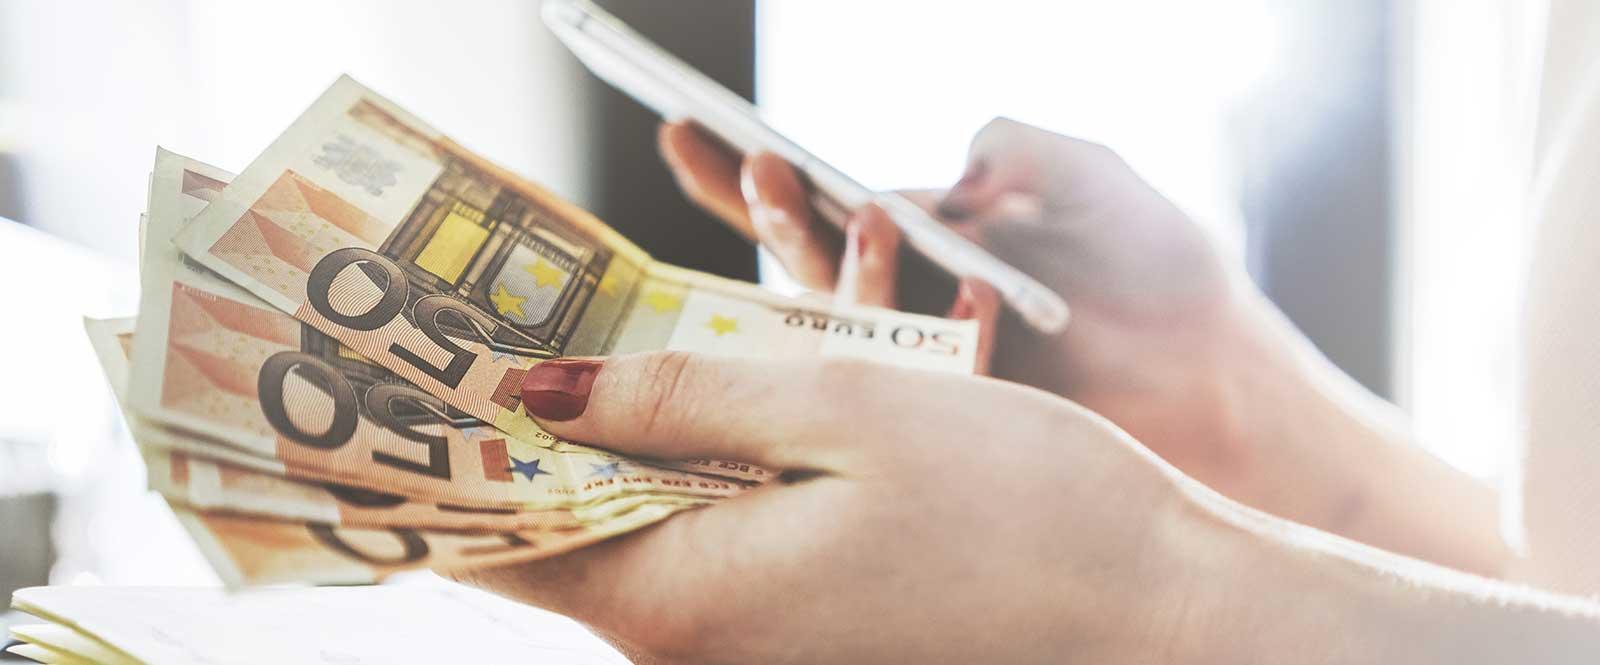 50 eurovky peniaze